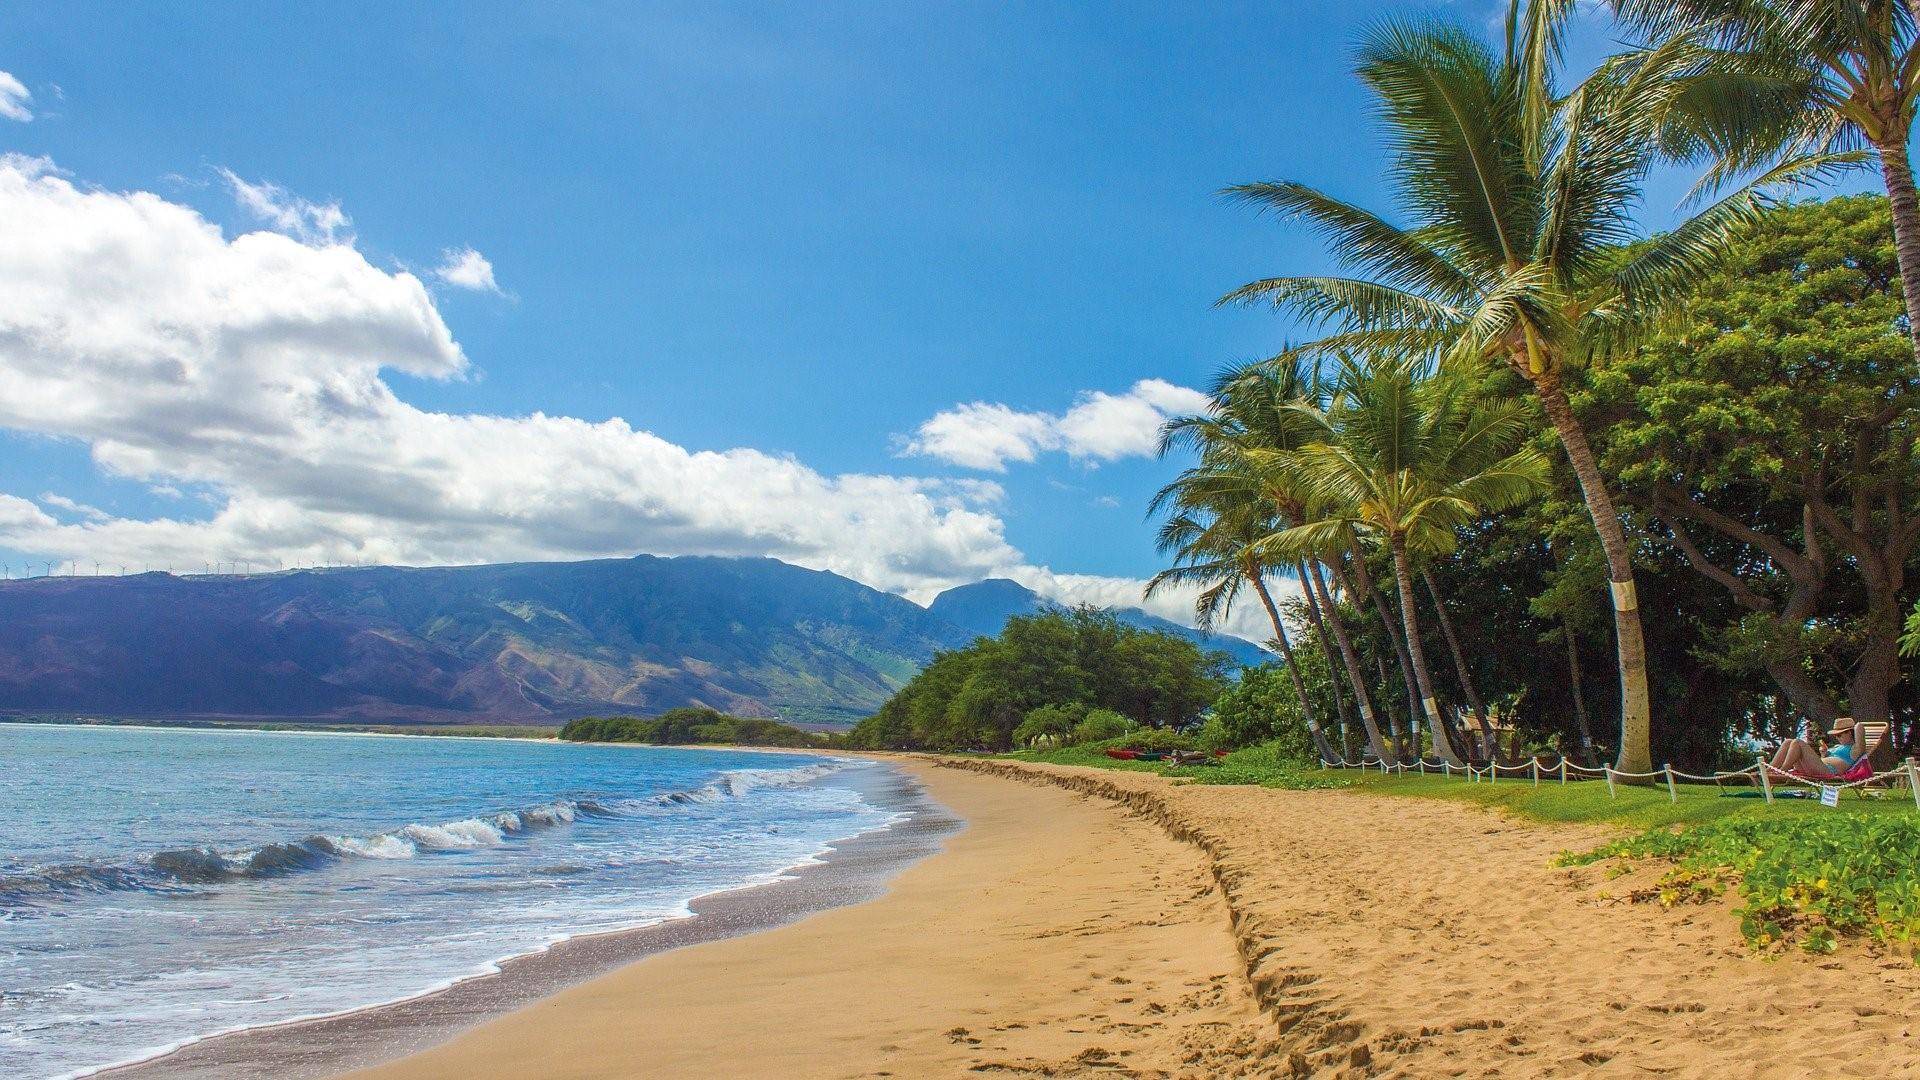 Summer Program - Environmental Conservation | Abbey Road Programs: Hawaiian Adventure